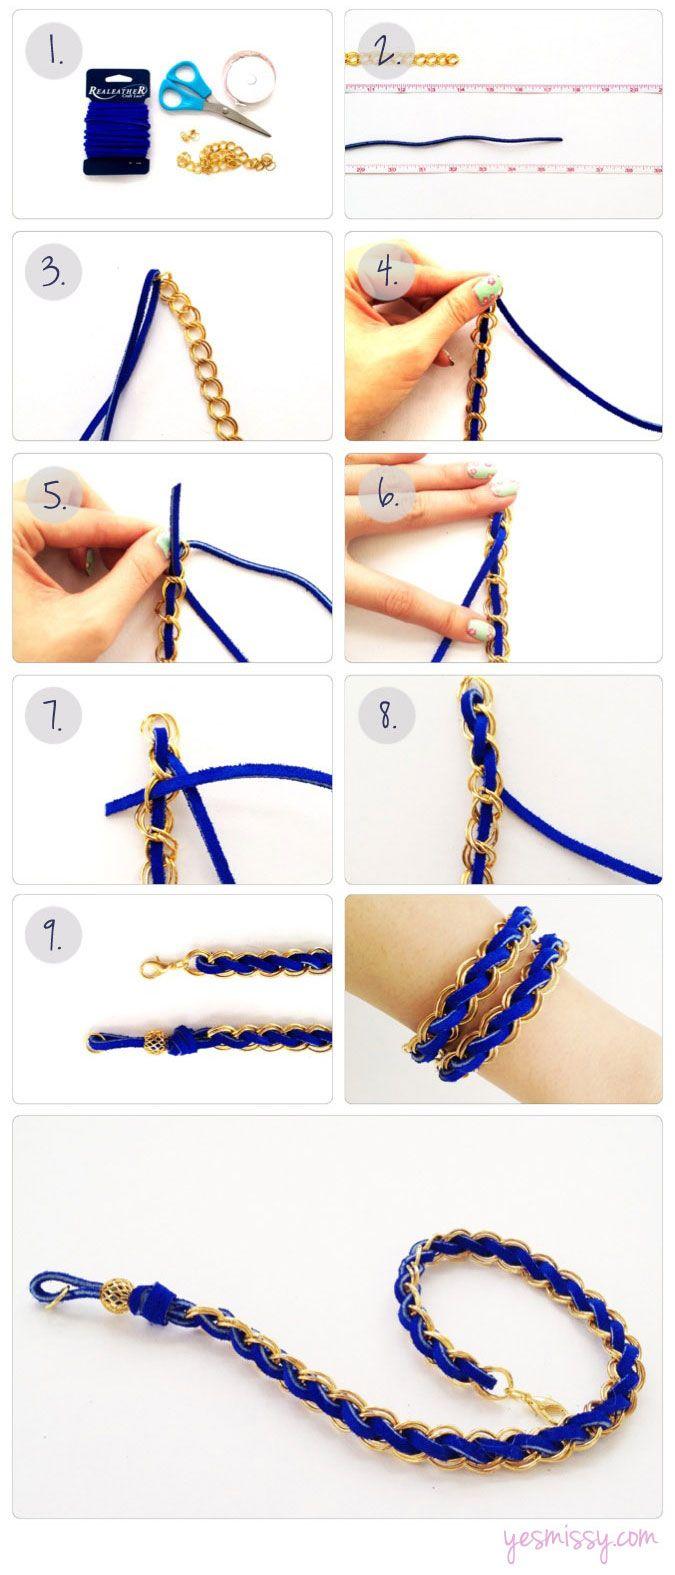 suede_chain_bracelet2_02